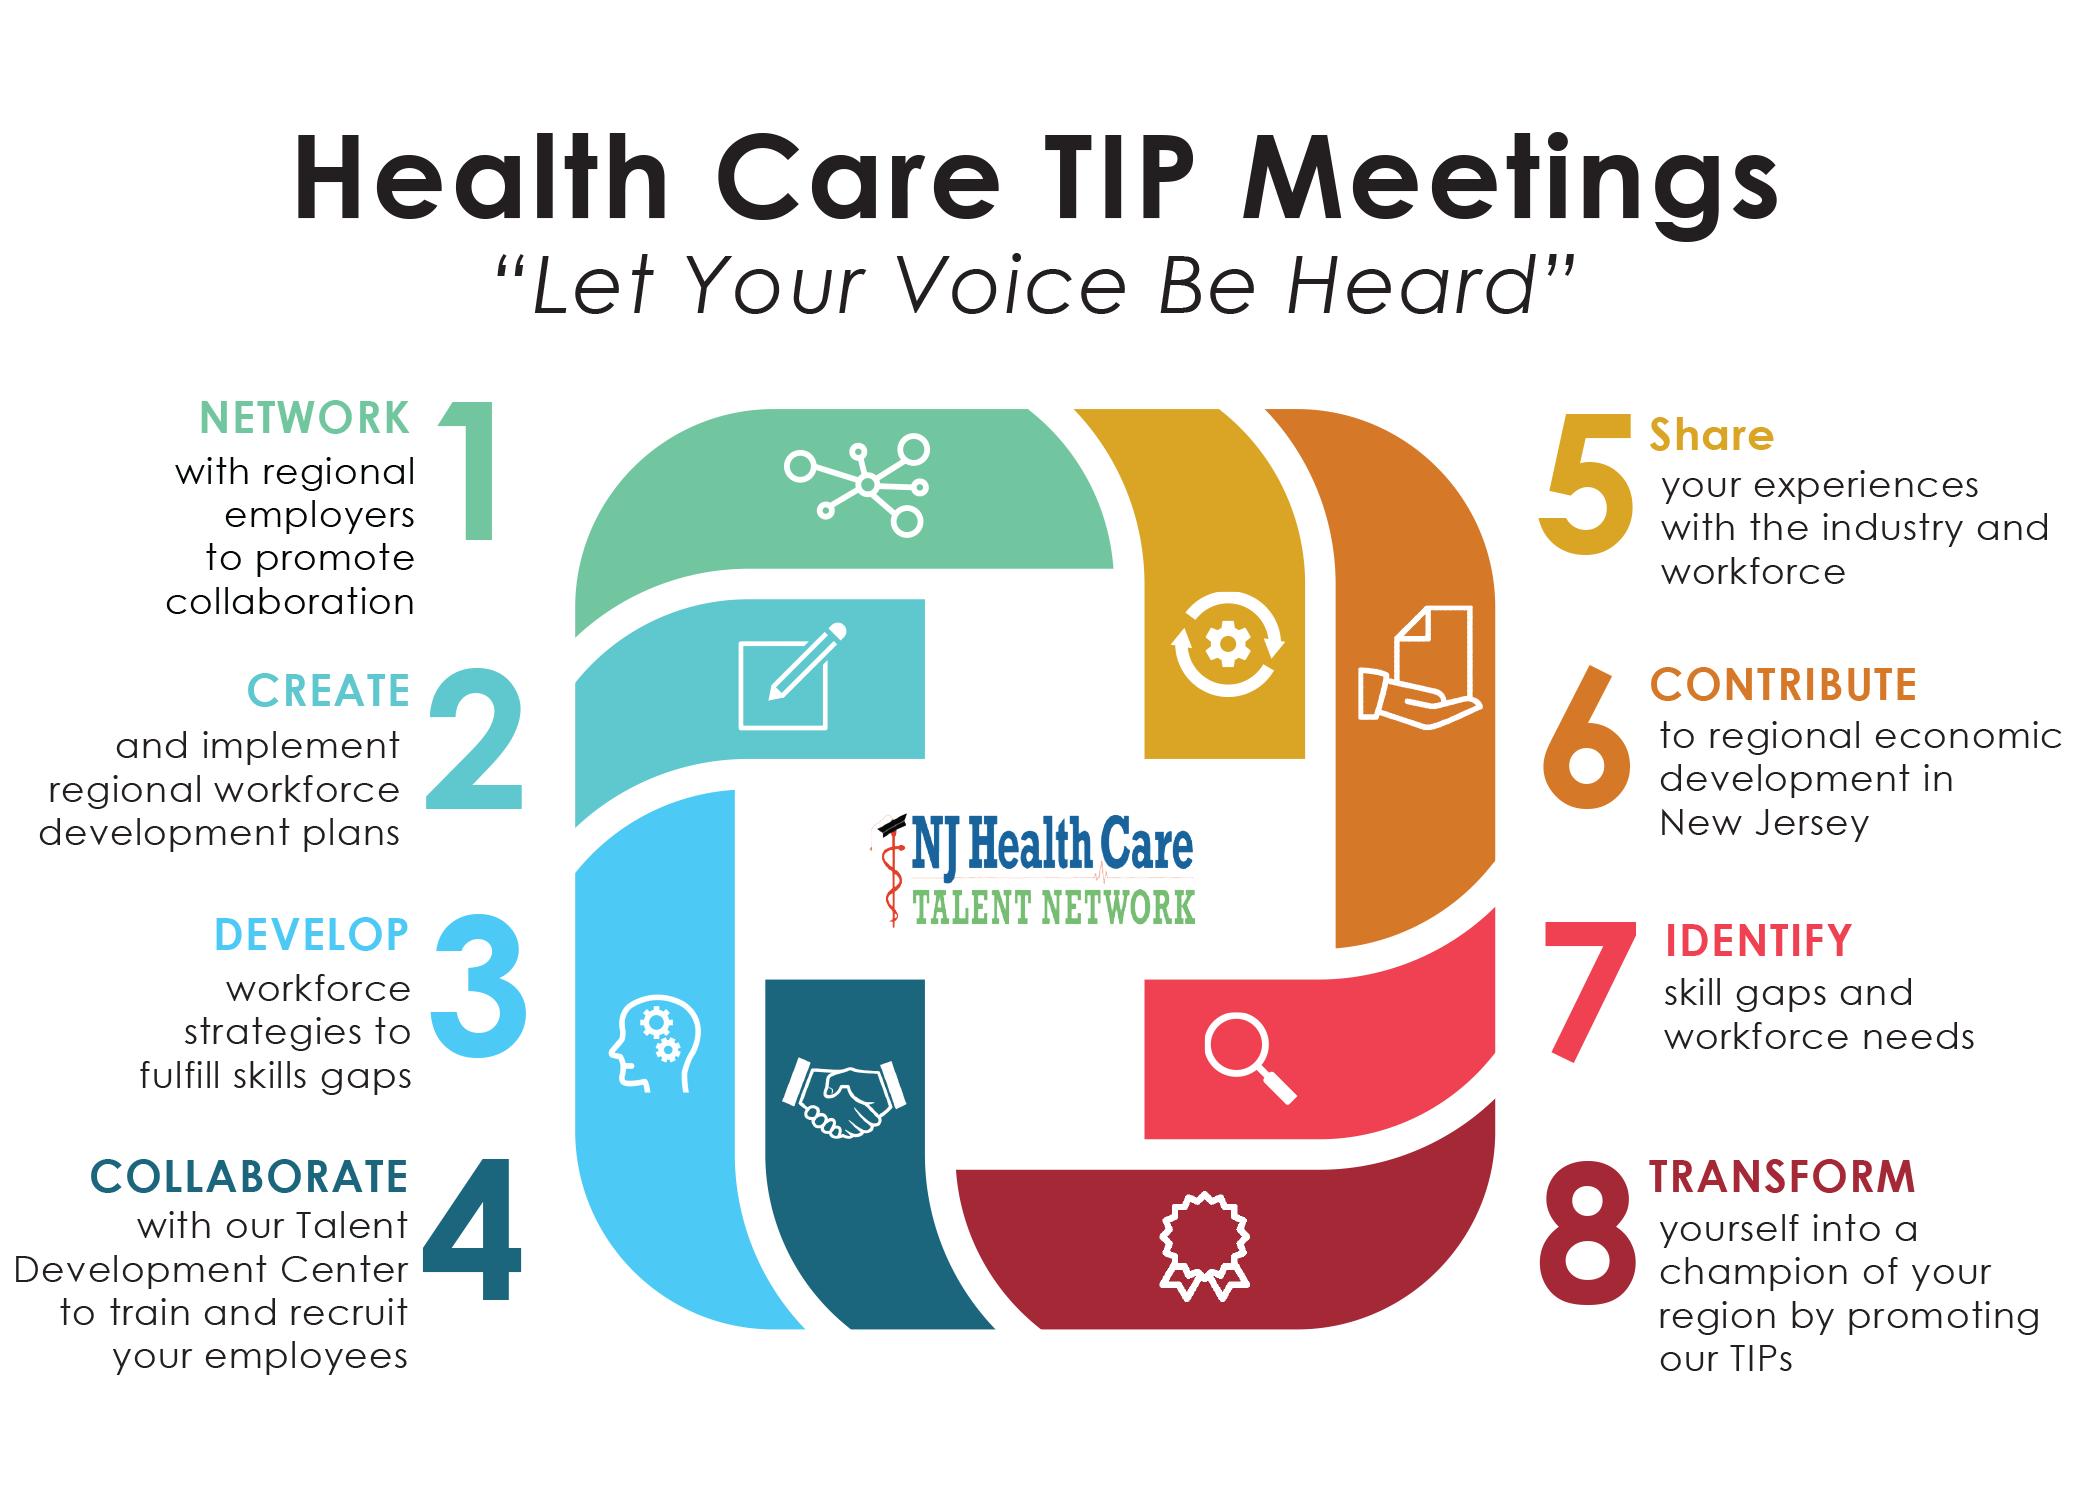 TIP Meeting pic